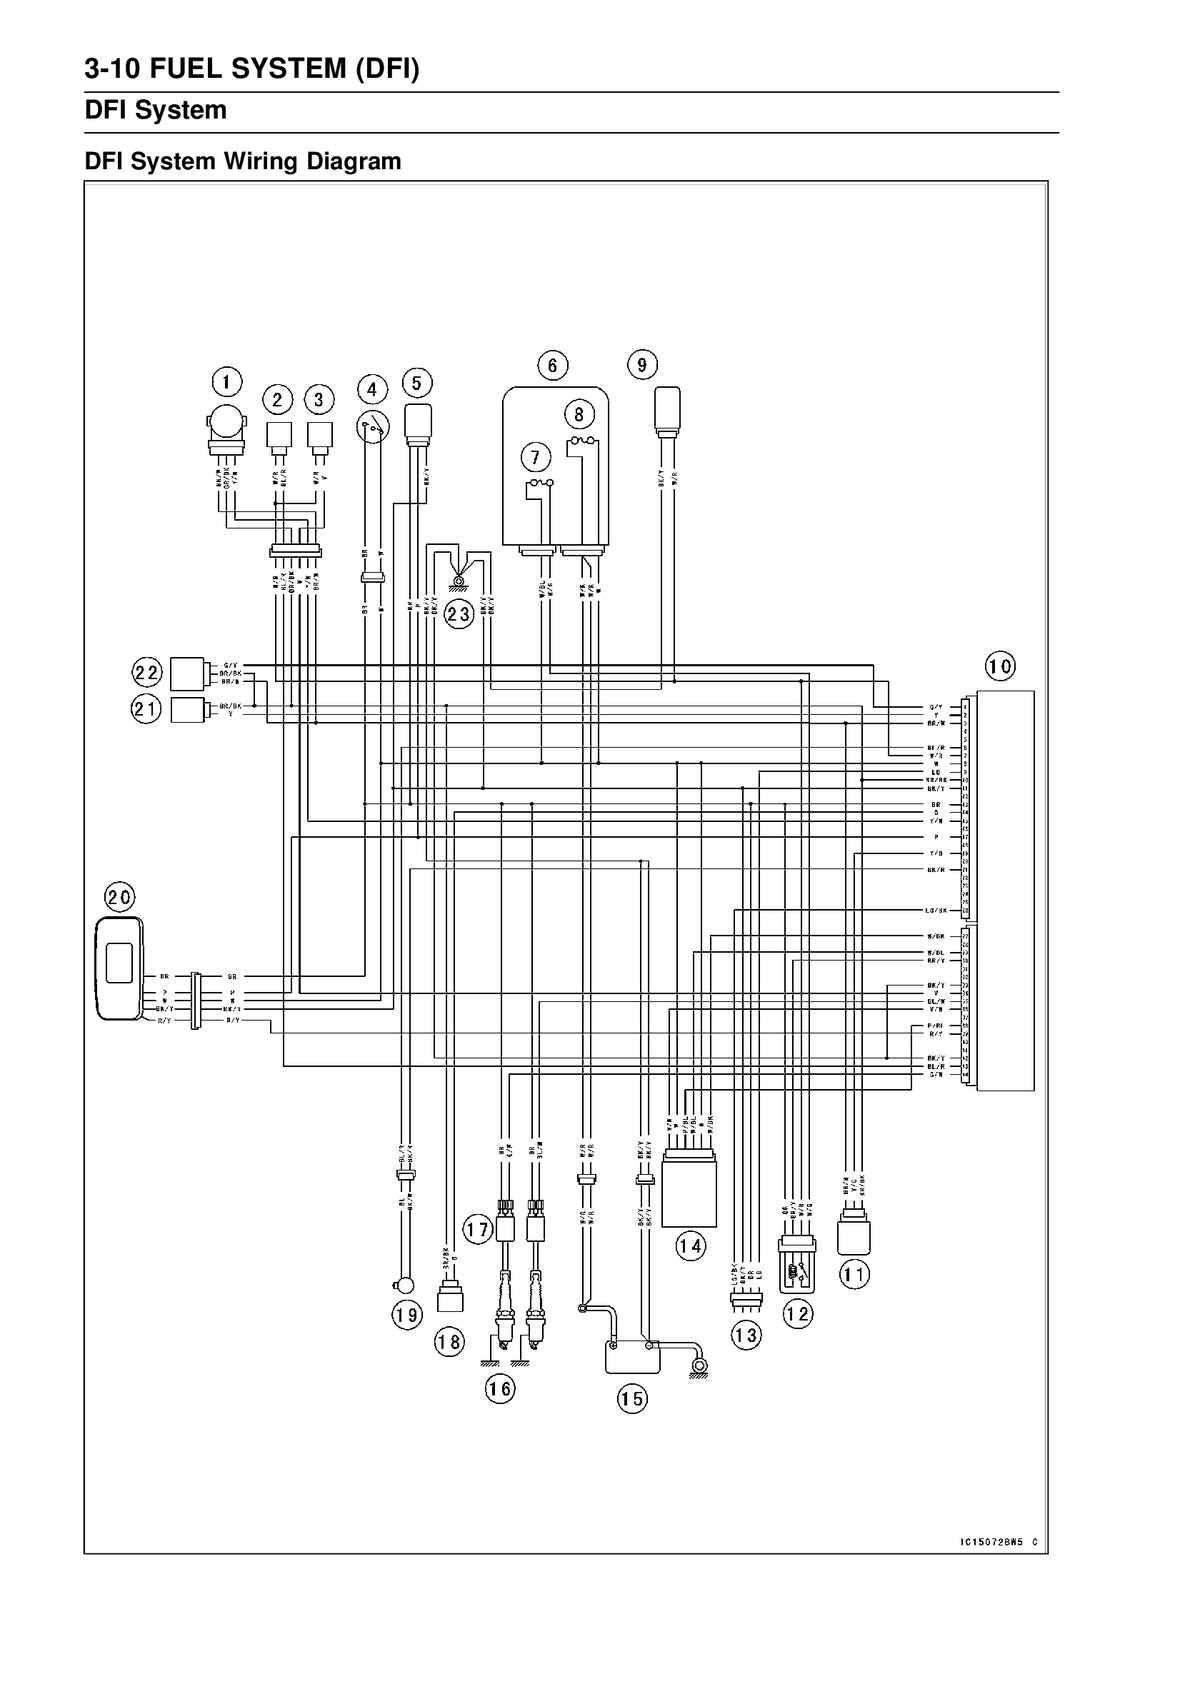 diagram of 3 1 rescue system cctv wiring connection calaméo kawasaki tery 750 fi 4x4 teryx le